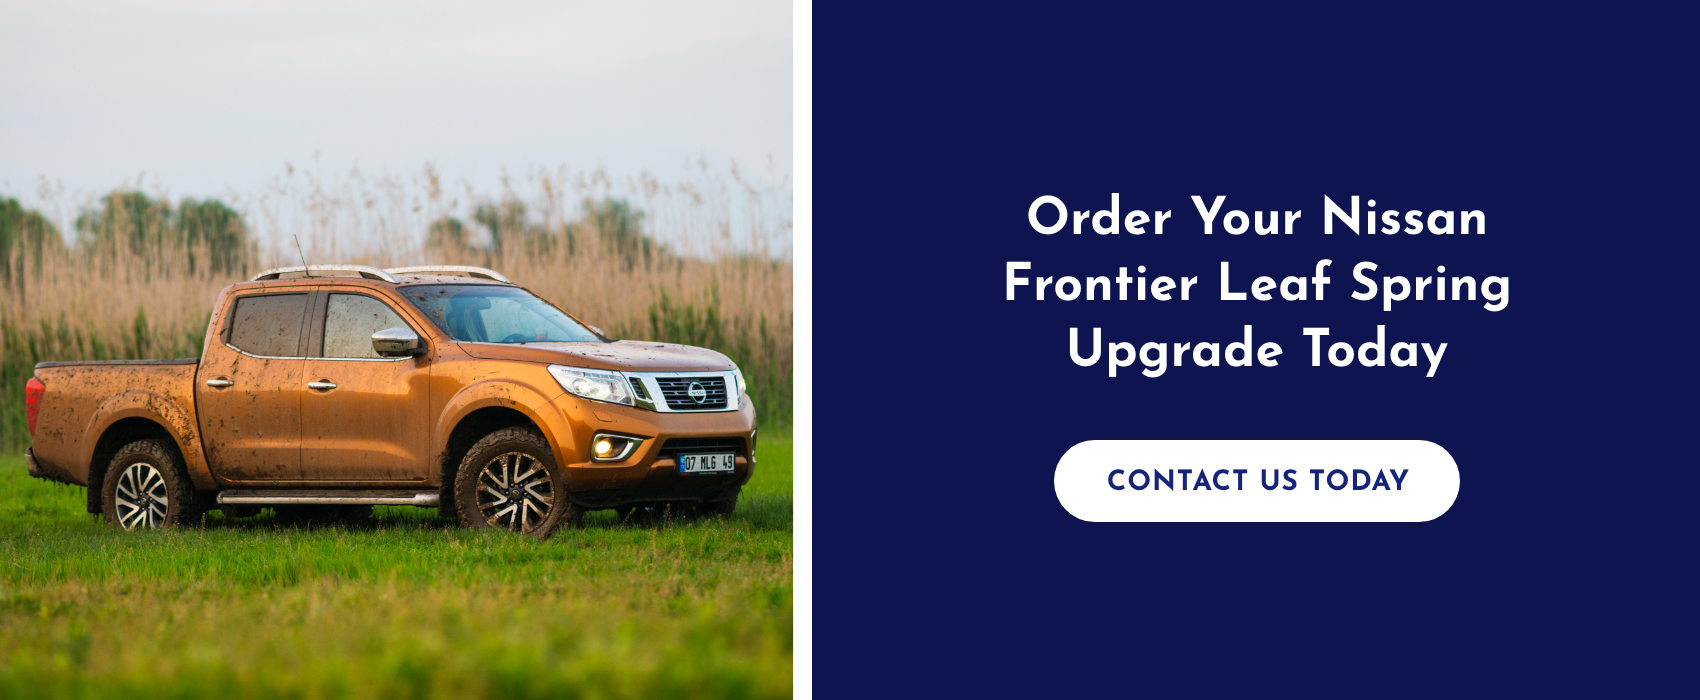 02-order-your-nissan-frontier-leaf-spring-upgrade-today.jpg